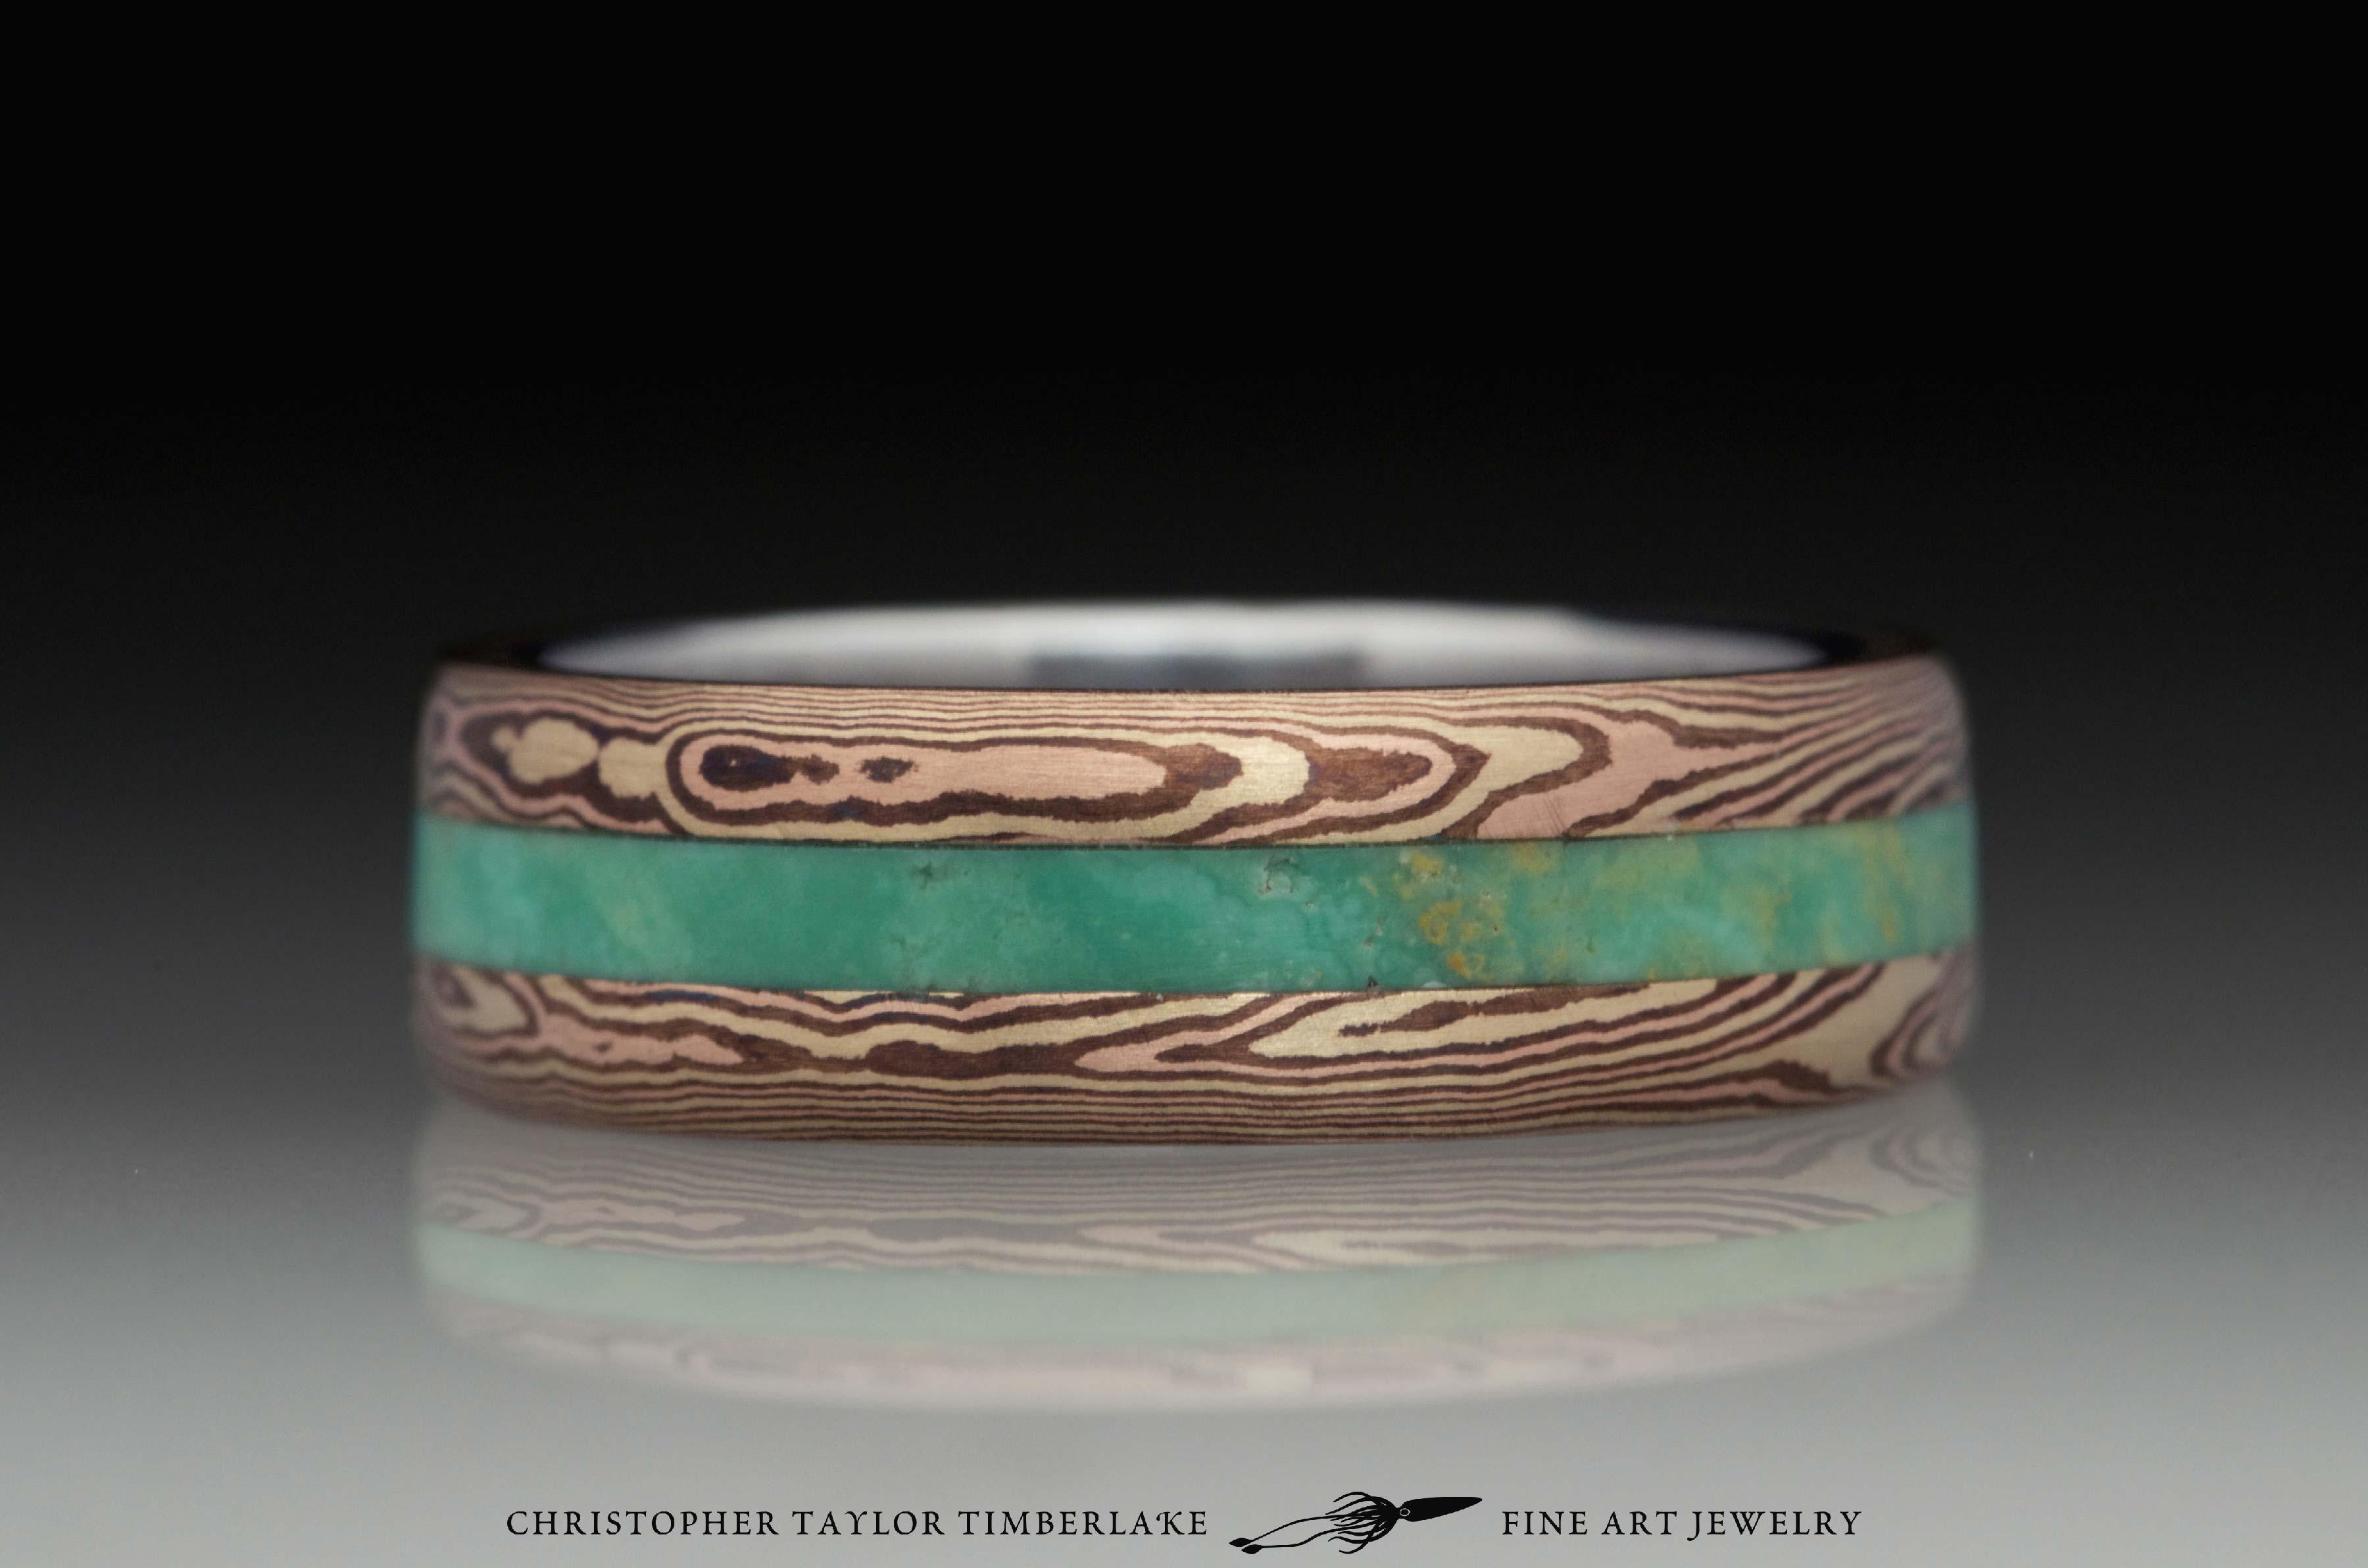 Mokumé-Mokume-Gane-Ring-(M84b)-14K-karat-yellow-gold,-14K-rose-gold,-shakudo-2k,-green-turquoise-inlay,-domed,-river-flow,-stainless-inner-band,-6mm-(2-2-2)–3